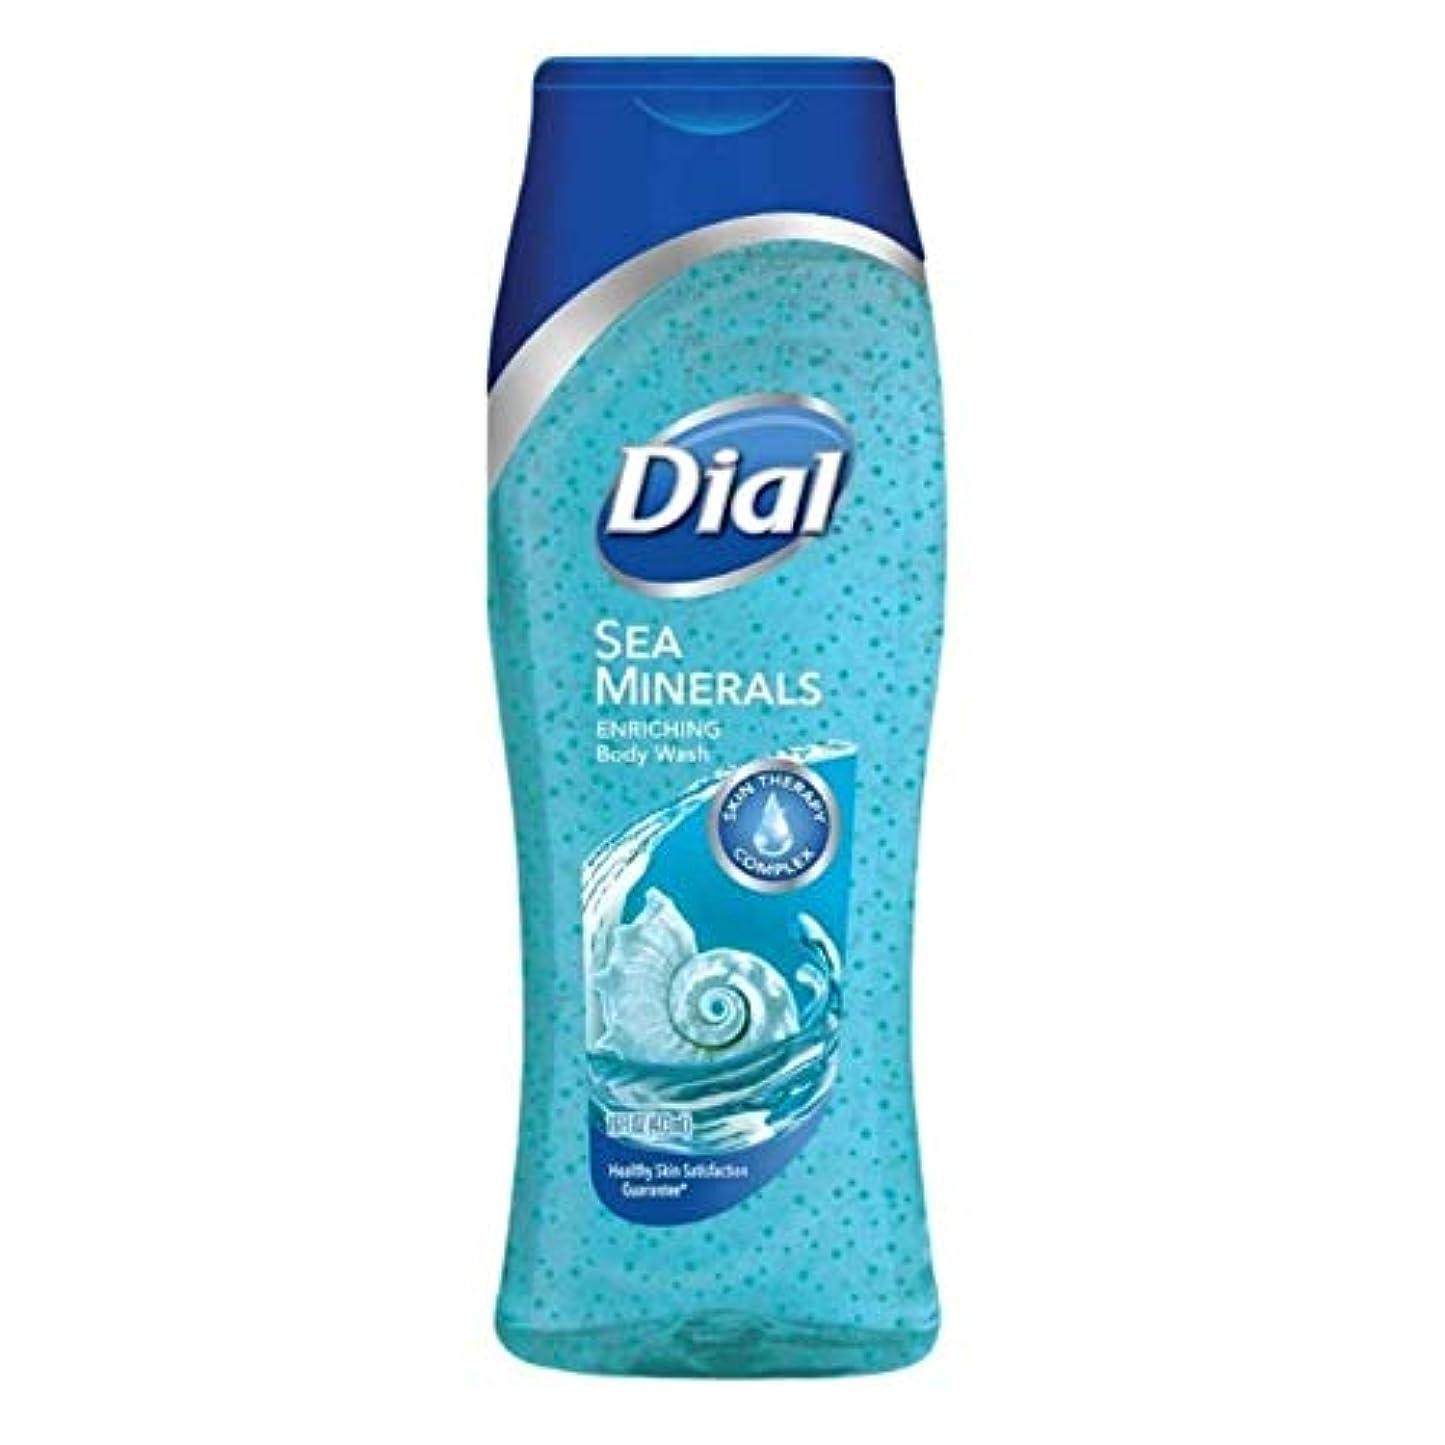 Dial Body Wash, Himalayan Salt & Exfoliating Beads, 16 Fl. Oz - 2 pk by Dial